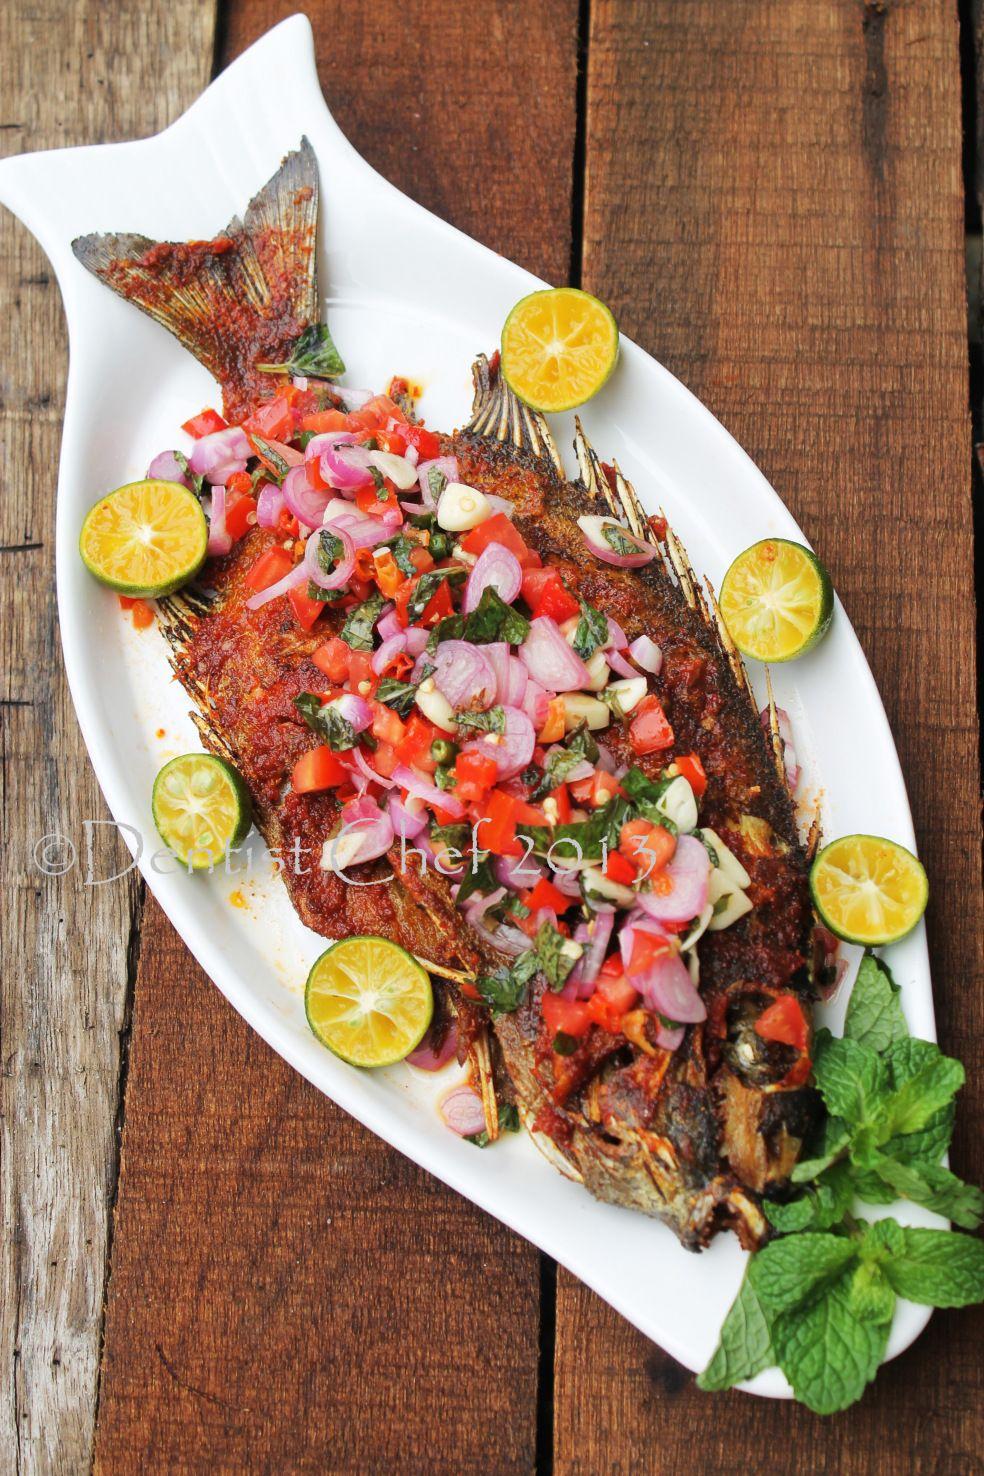 Ikan Baronang Bakar Bumbu Rica Rica Sambal Dabu Dabu Grilled Rabbit Fish With Spicy Rica Rica Dabu Dabu Salsa Resep Ikan Bakar Resep Ikan Masakan Indonesia